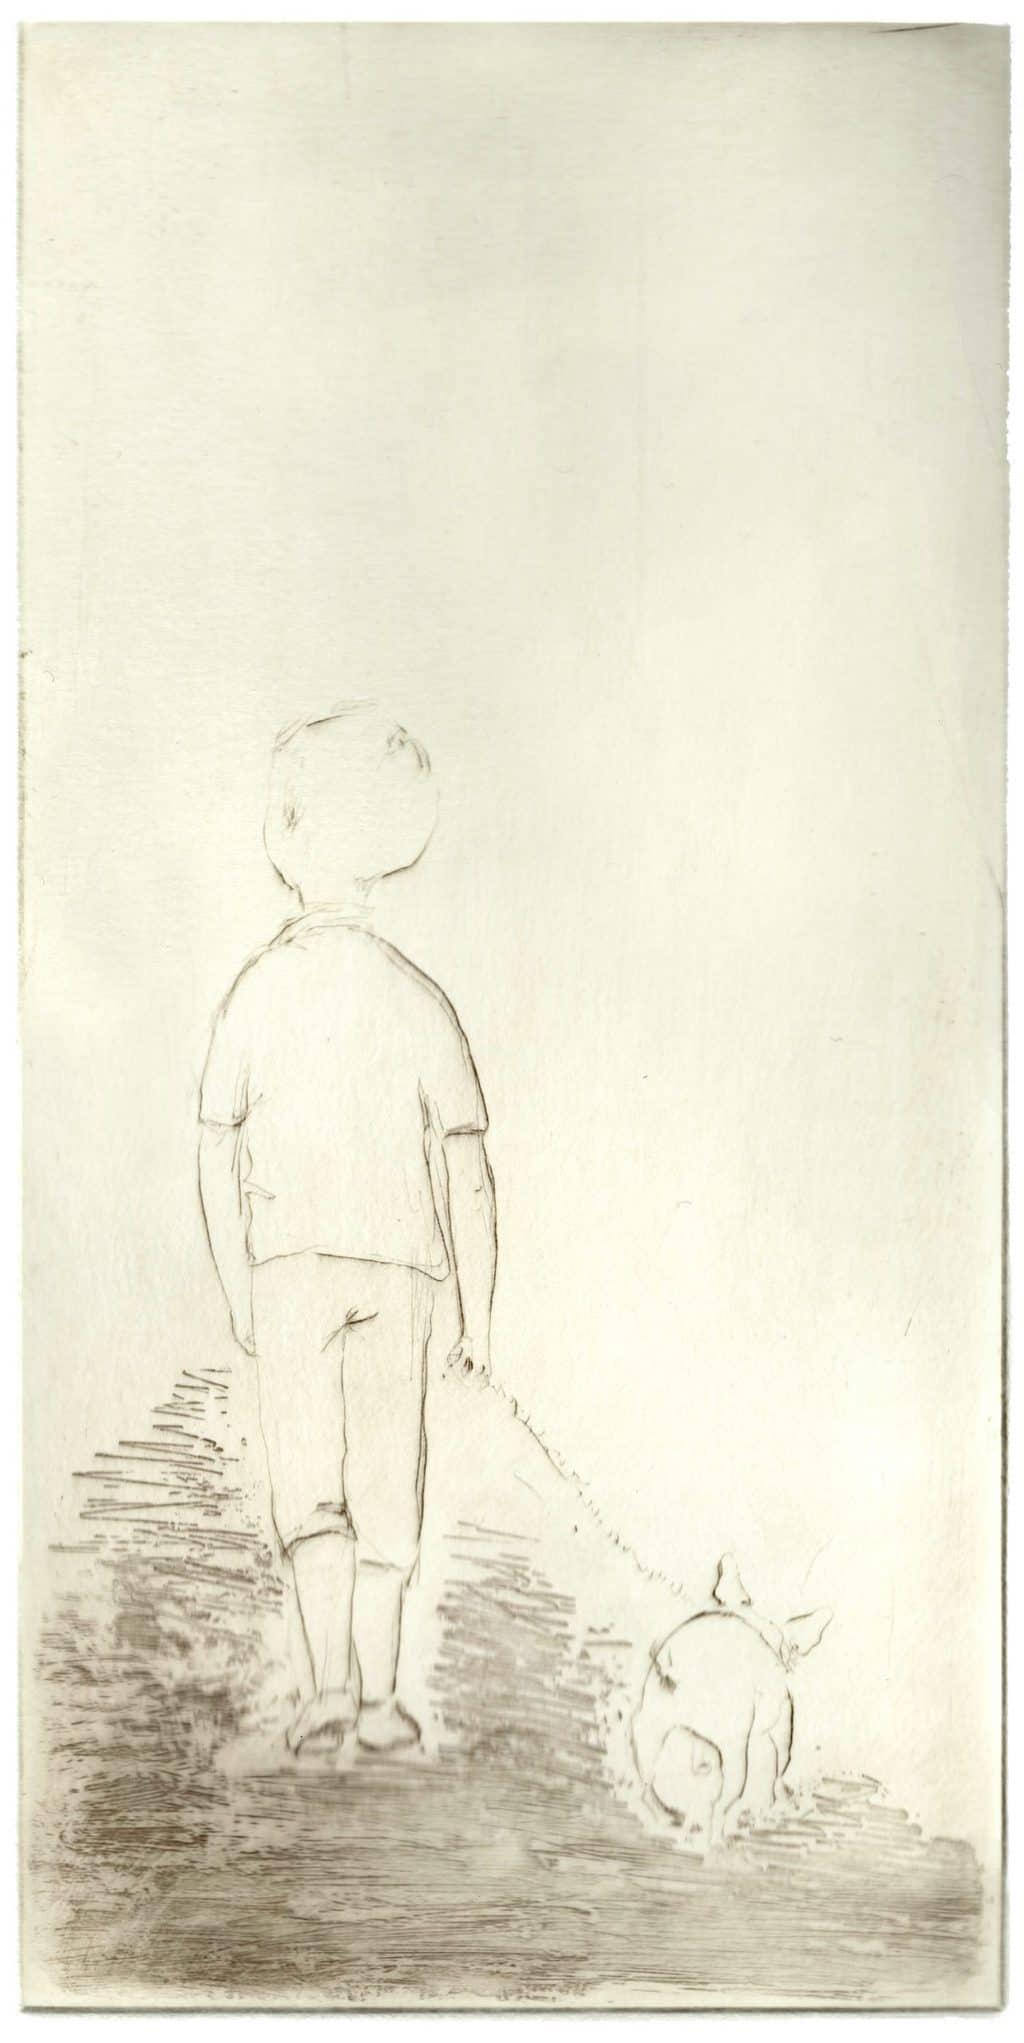 """A Walk"" - line drawing of a boy walking with a dog, French Bulldog. Original print drypoint by British painter-printmaker Marina Kim"